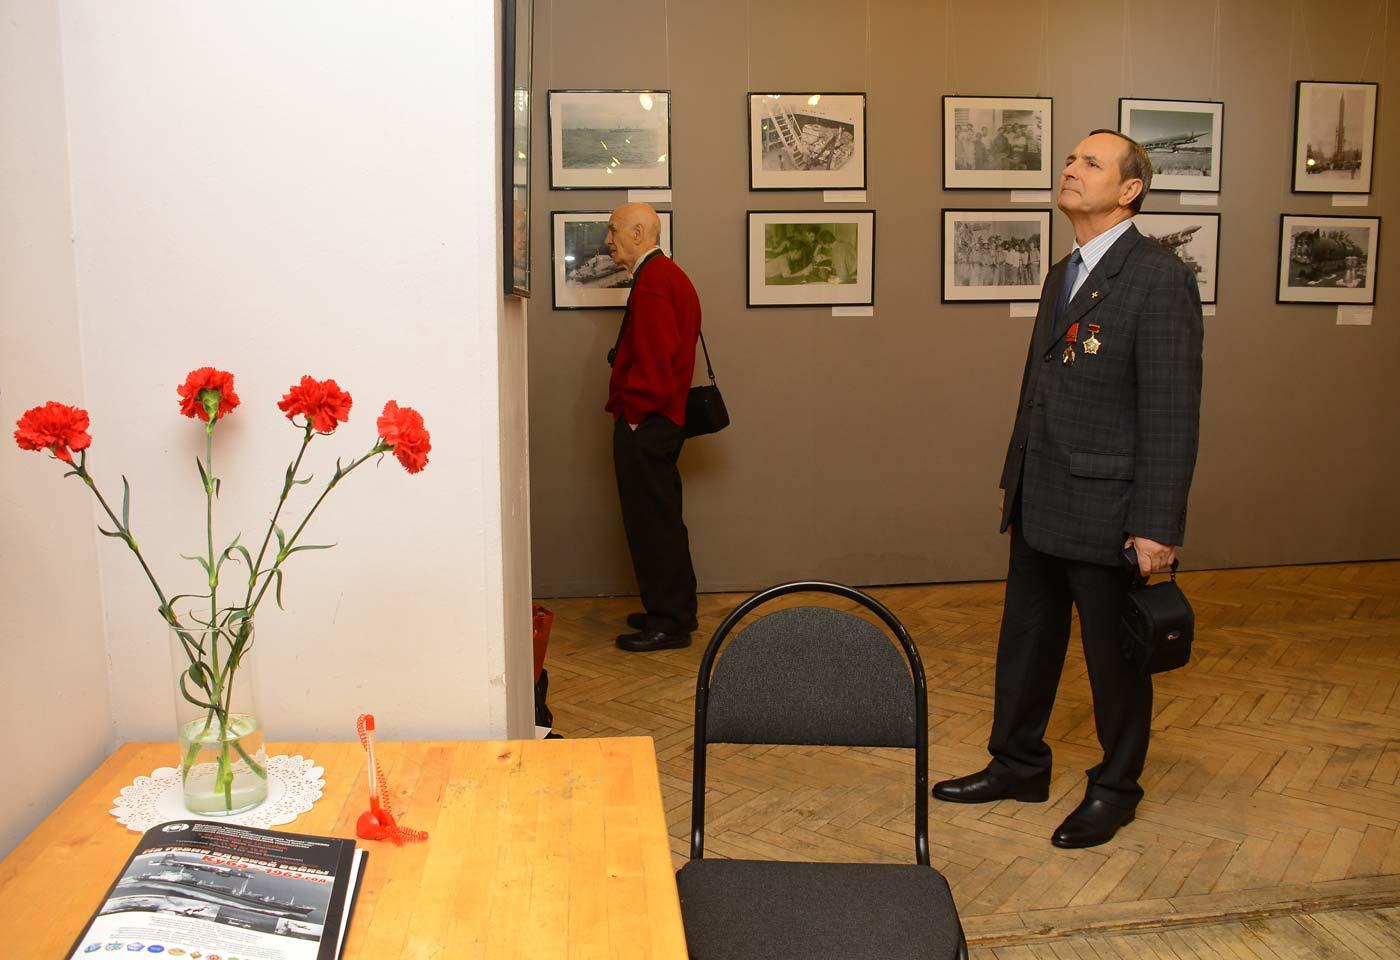 2016-10-27. Снимки от организаторов выставки. Фото 1